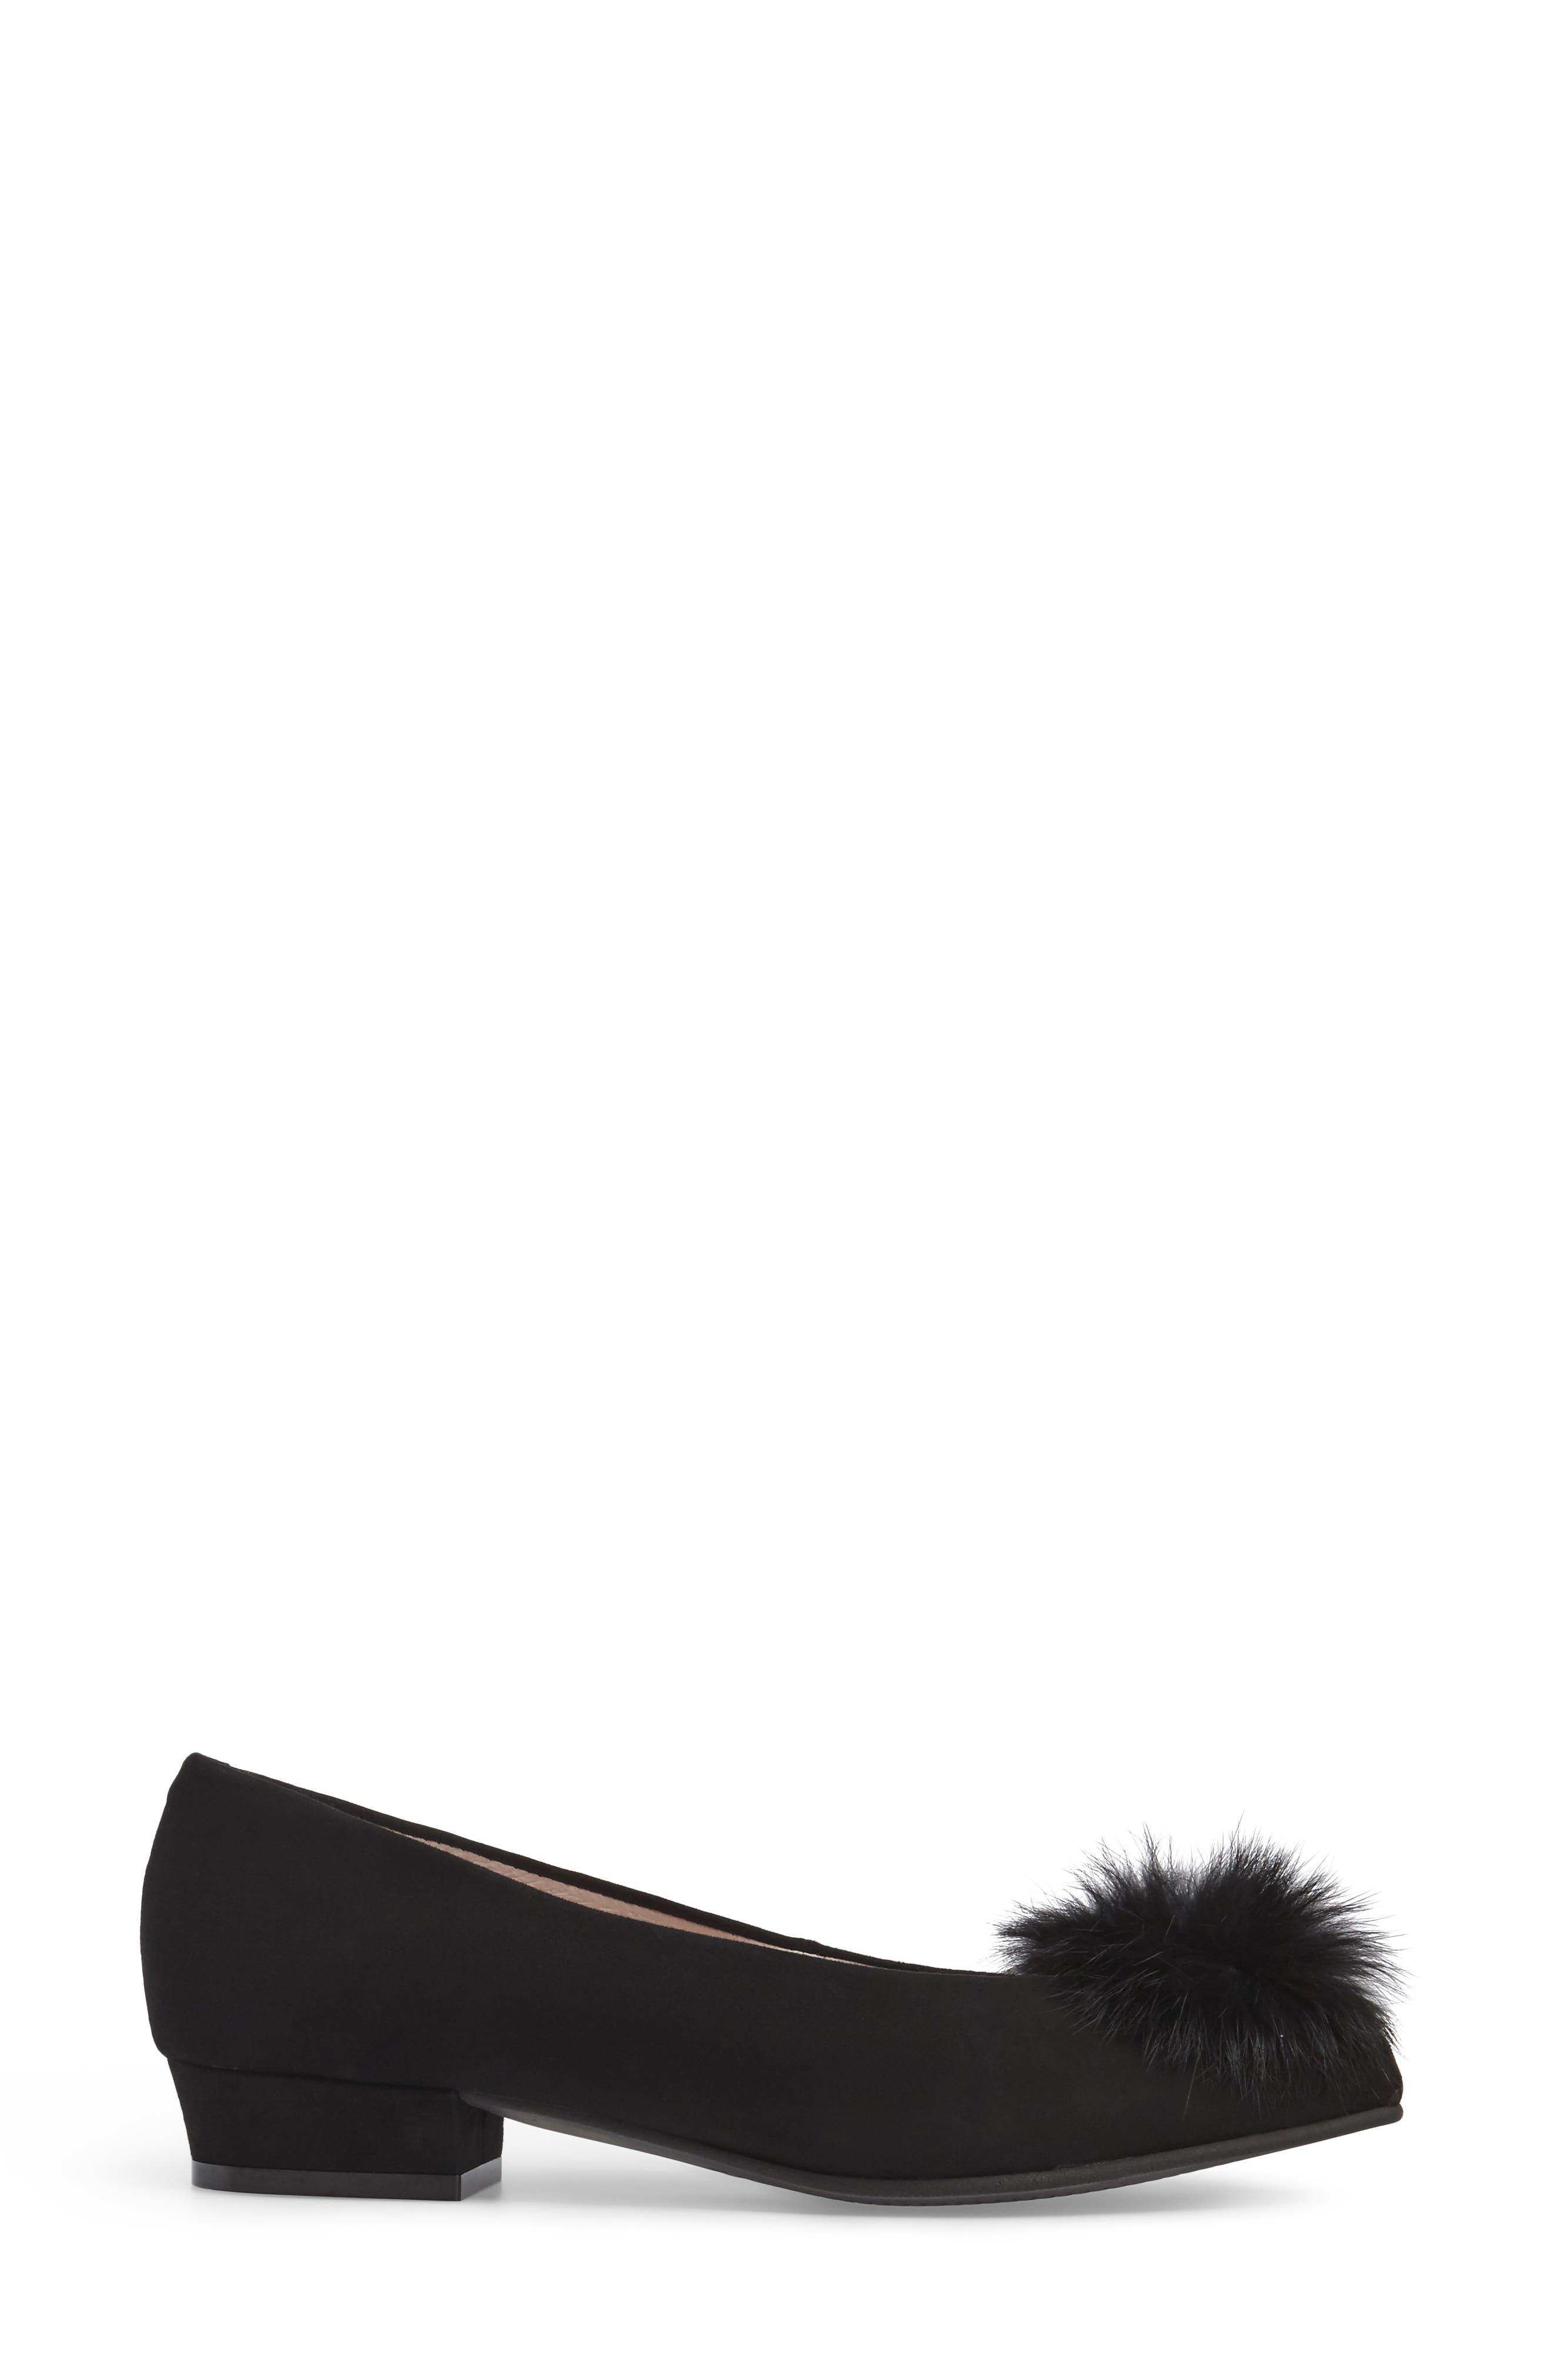 Sandy Flat with Genuine Rabbit Fur Pom,                             Alternate thumbnail 3, color,                             001